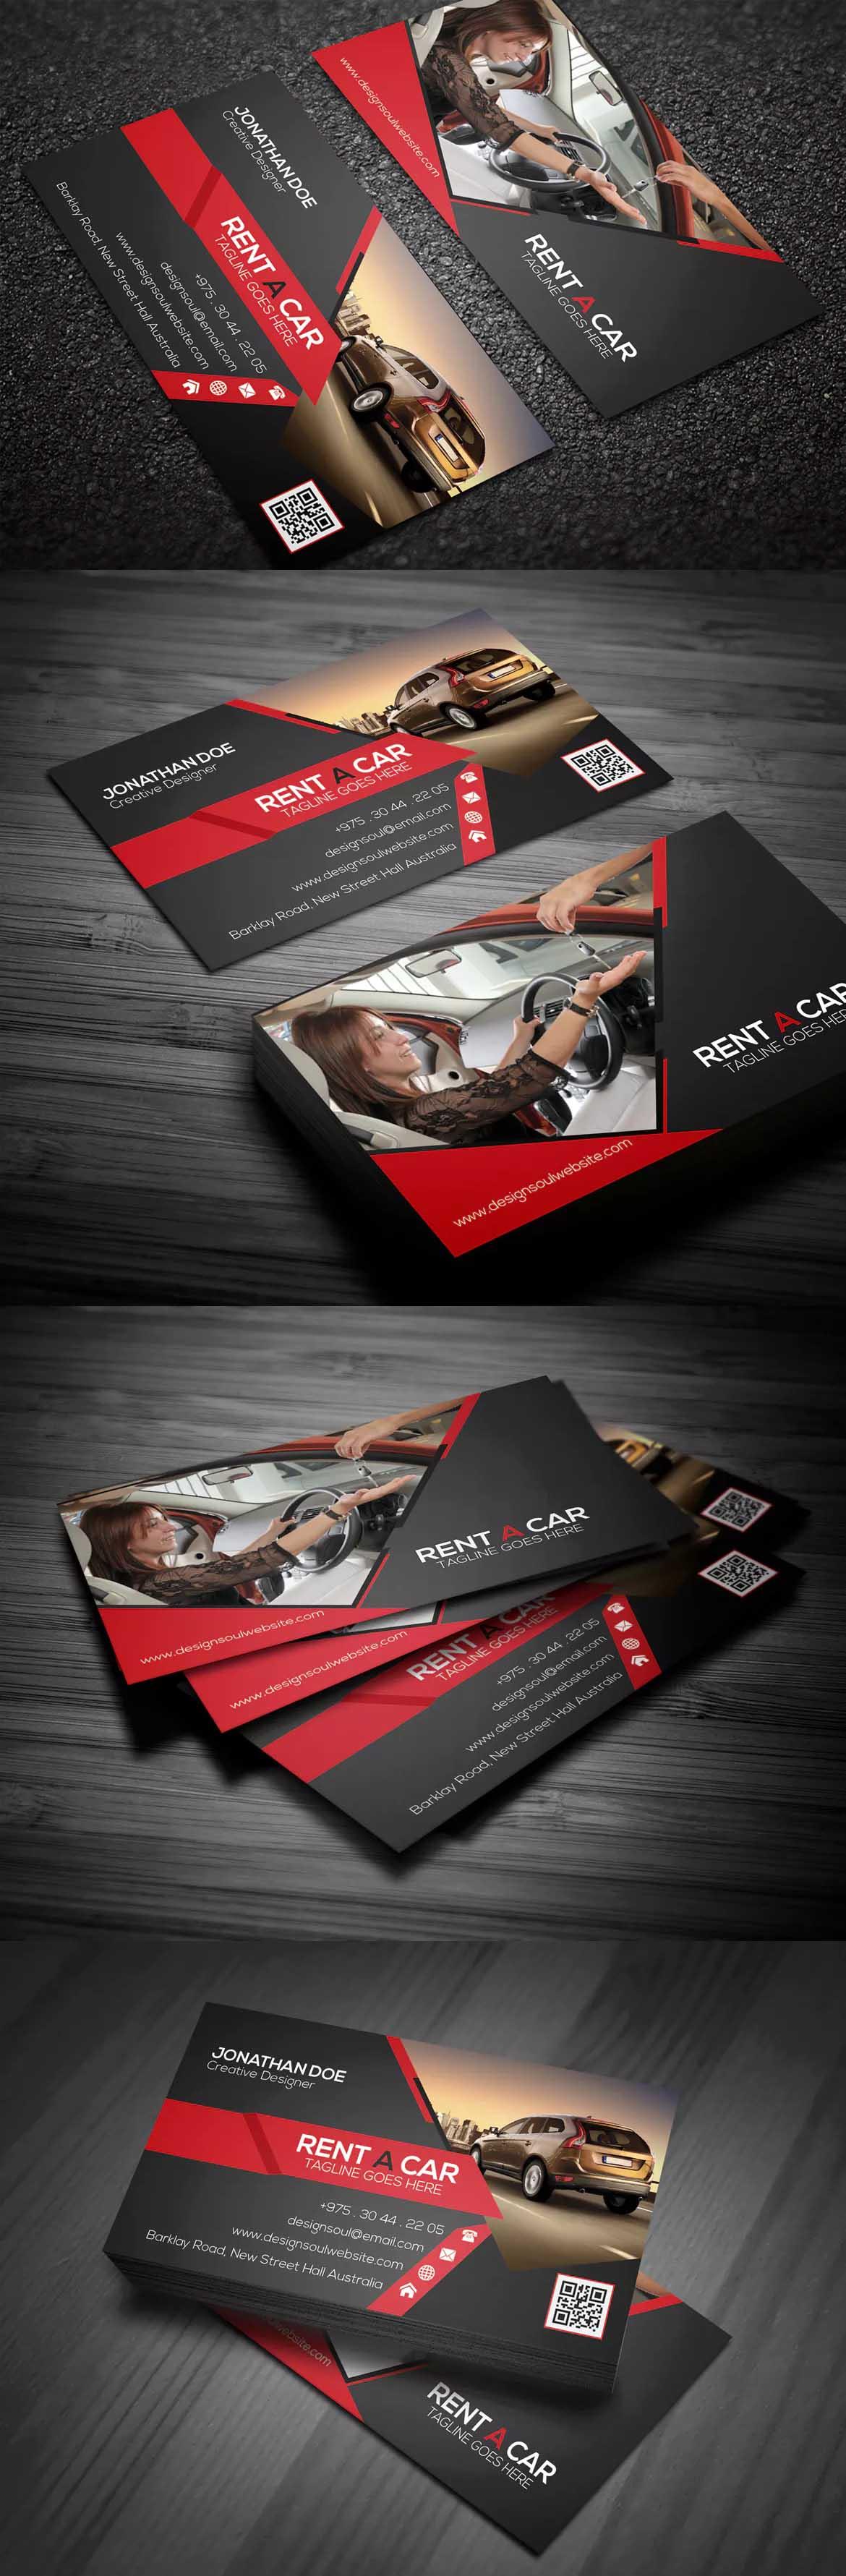 Rent A Car Business Card Template PSD Business Card Templates - Automotive business card templates